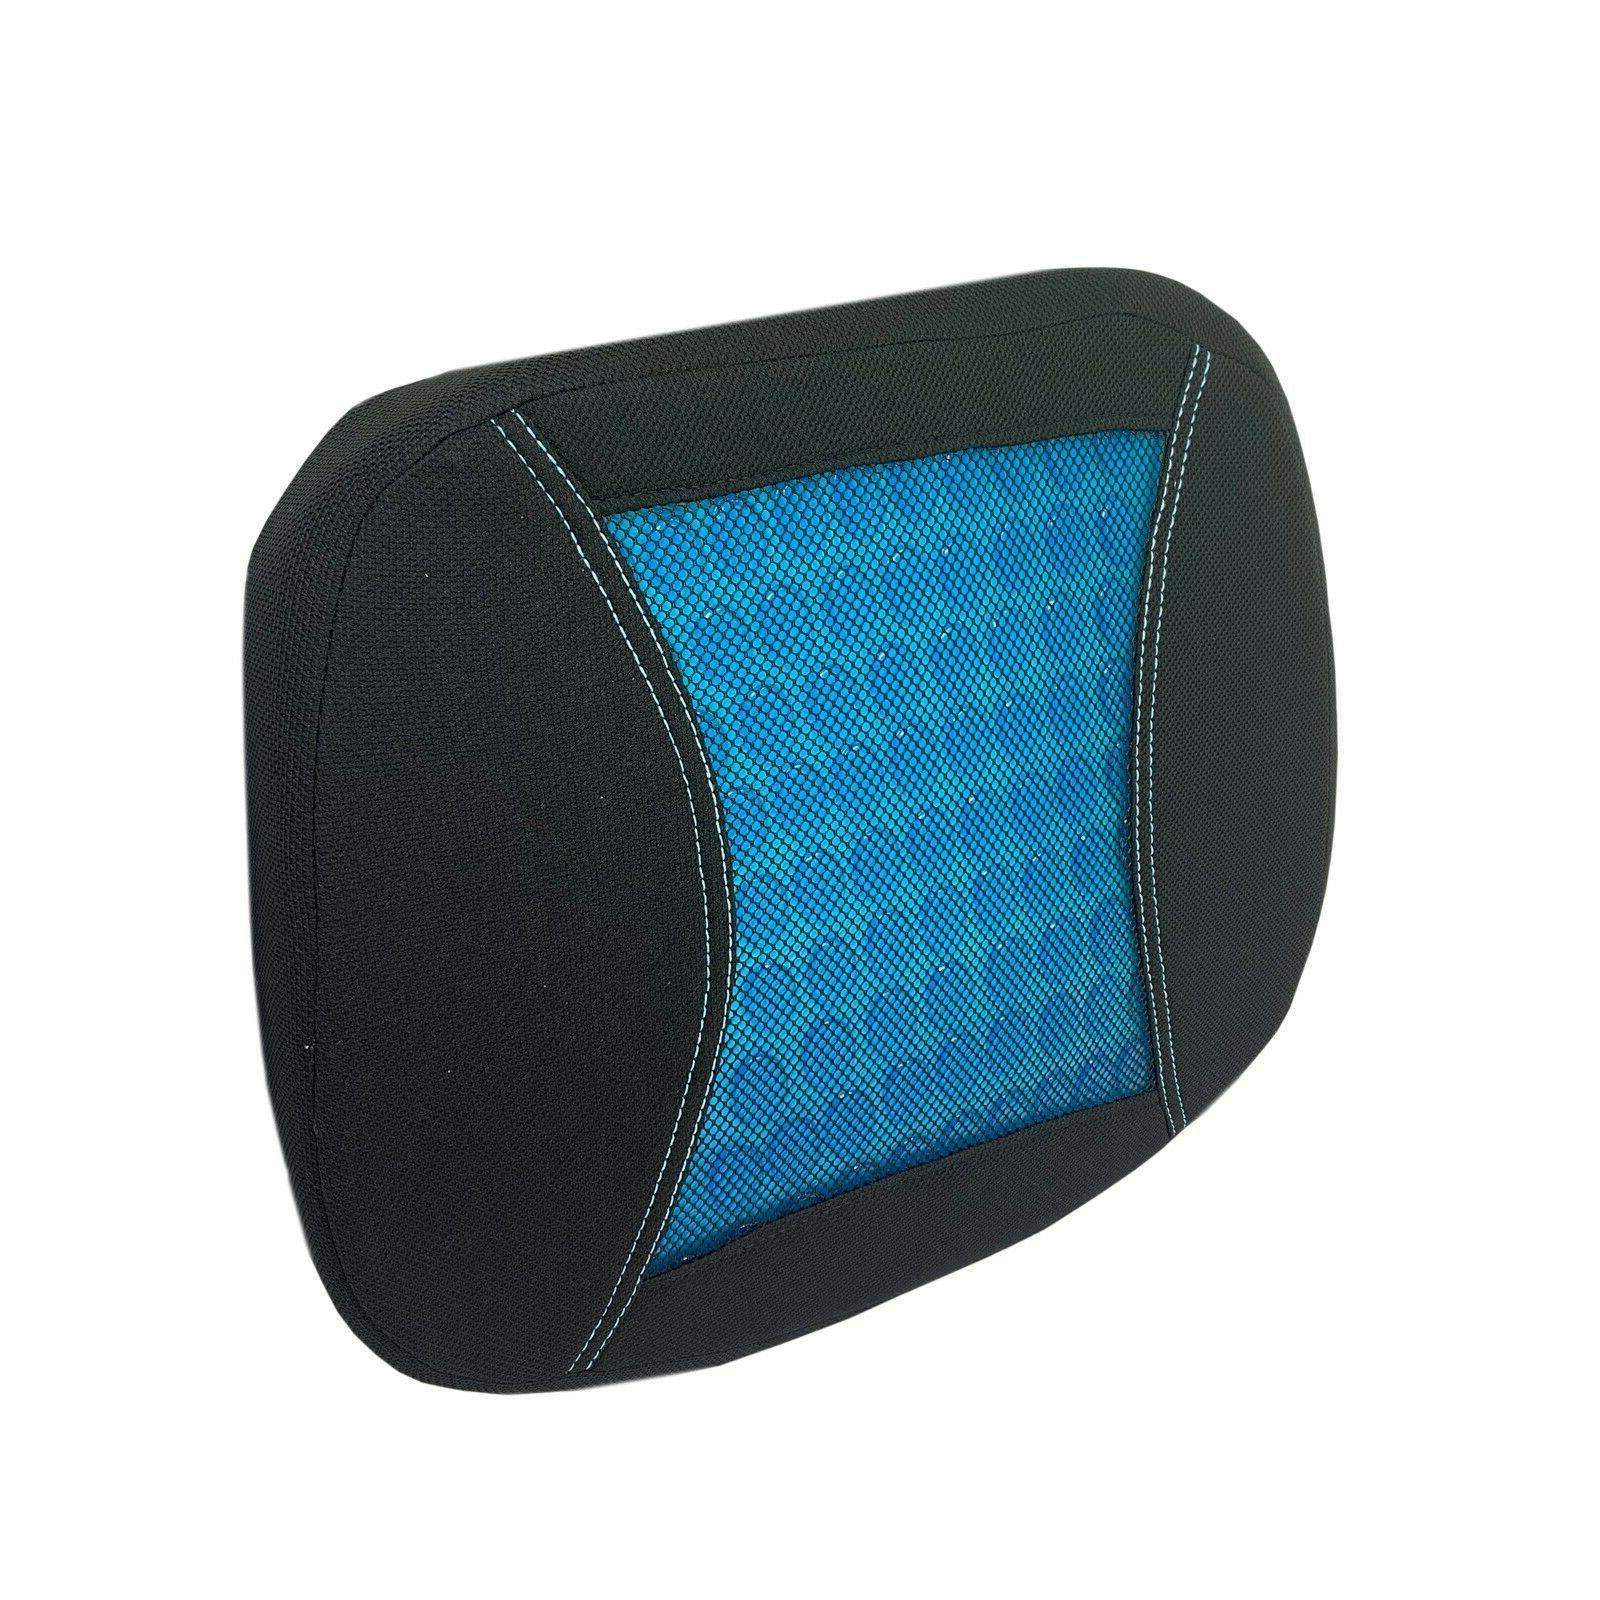 Orthopedic Gel Foam Chair Cushion